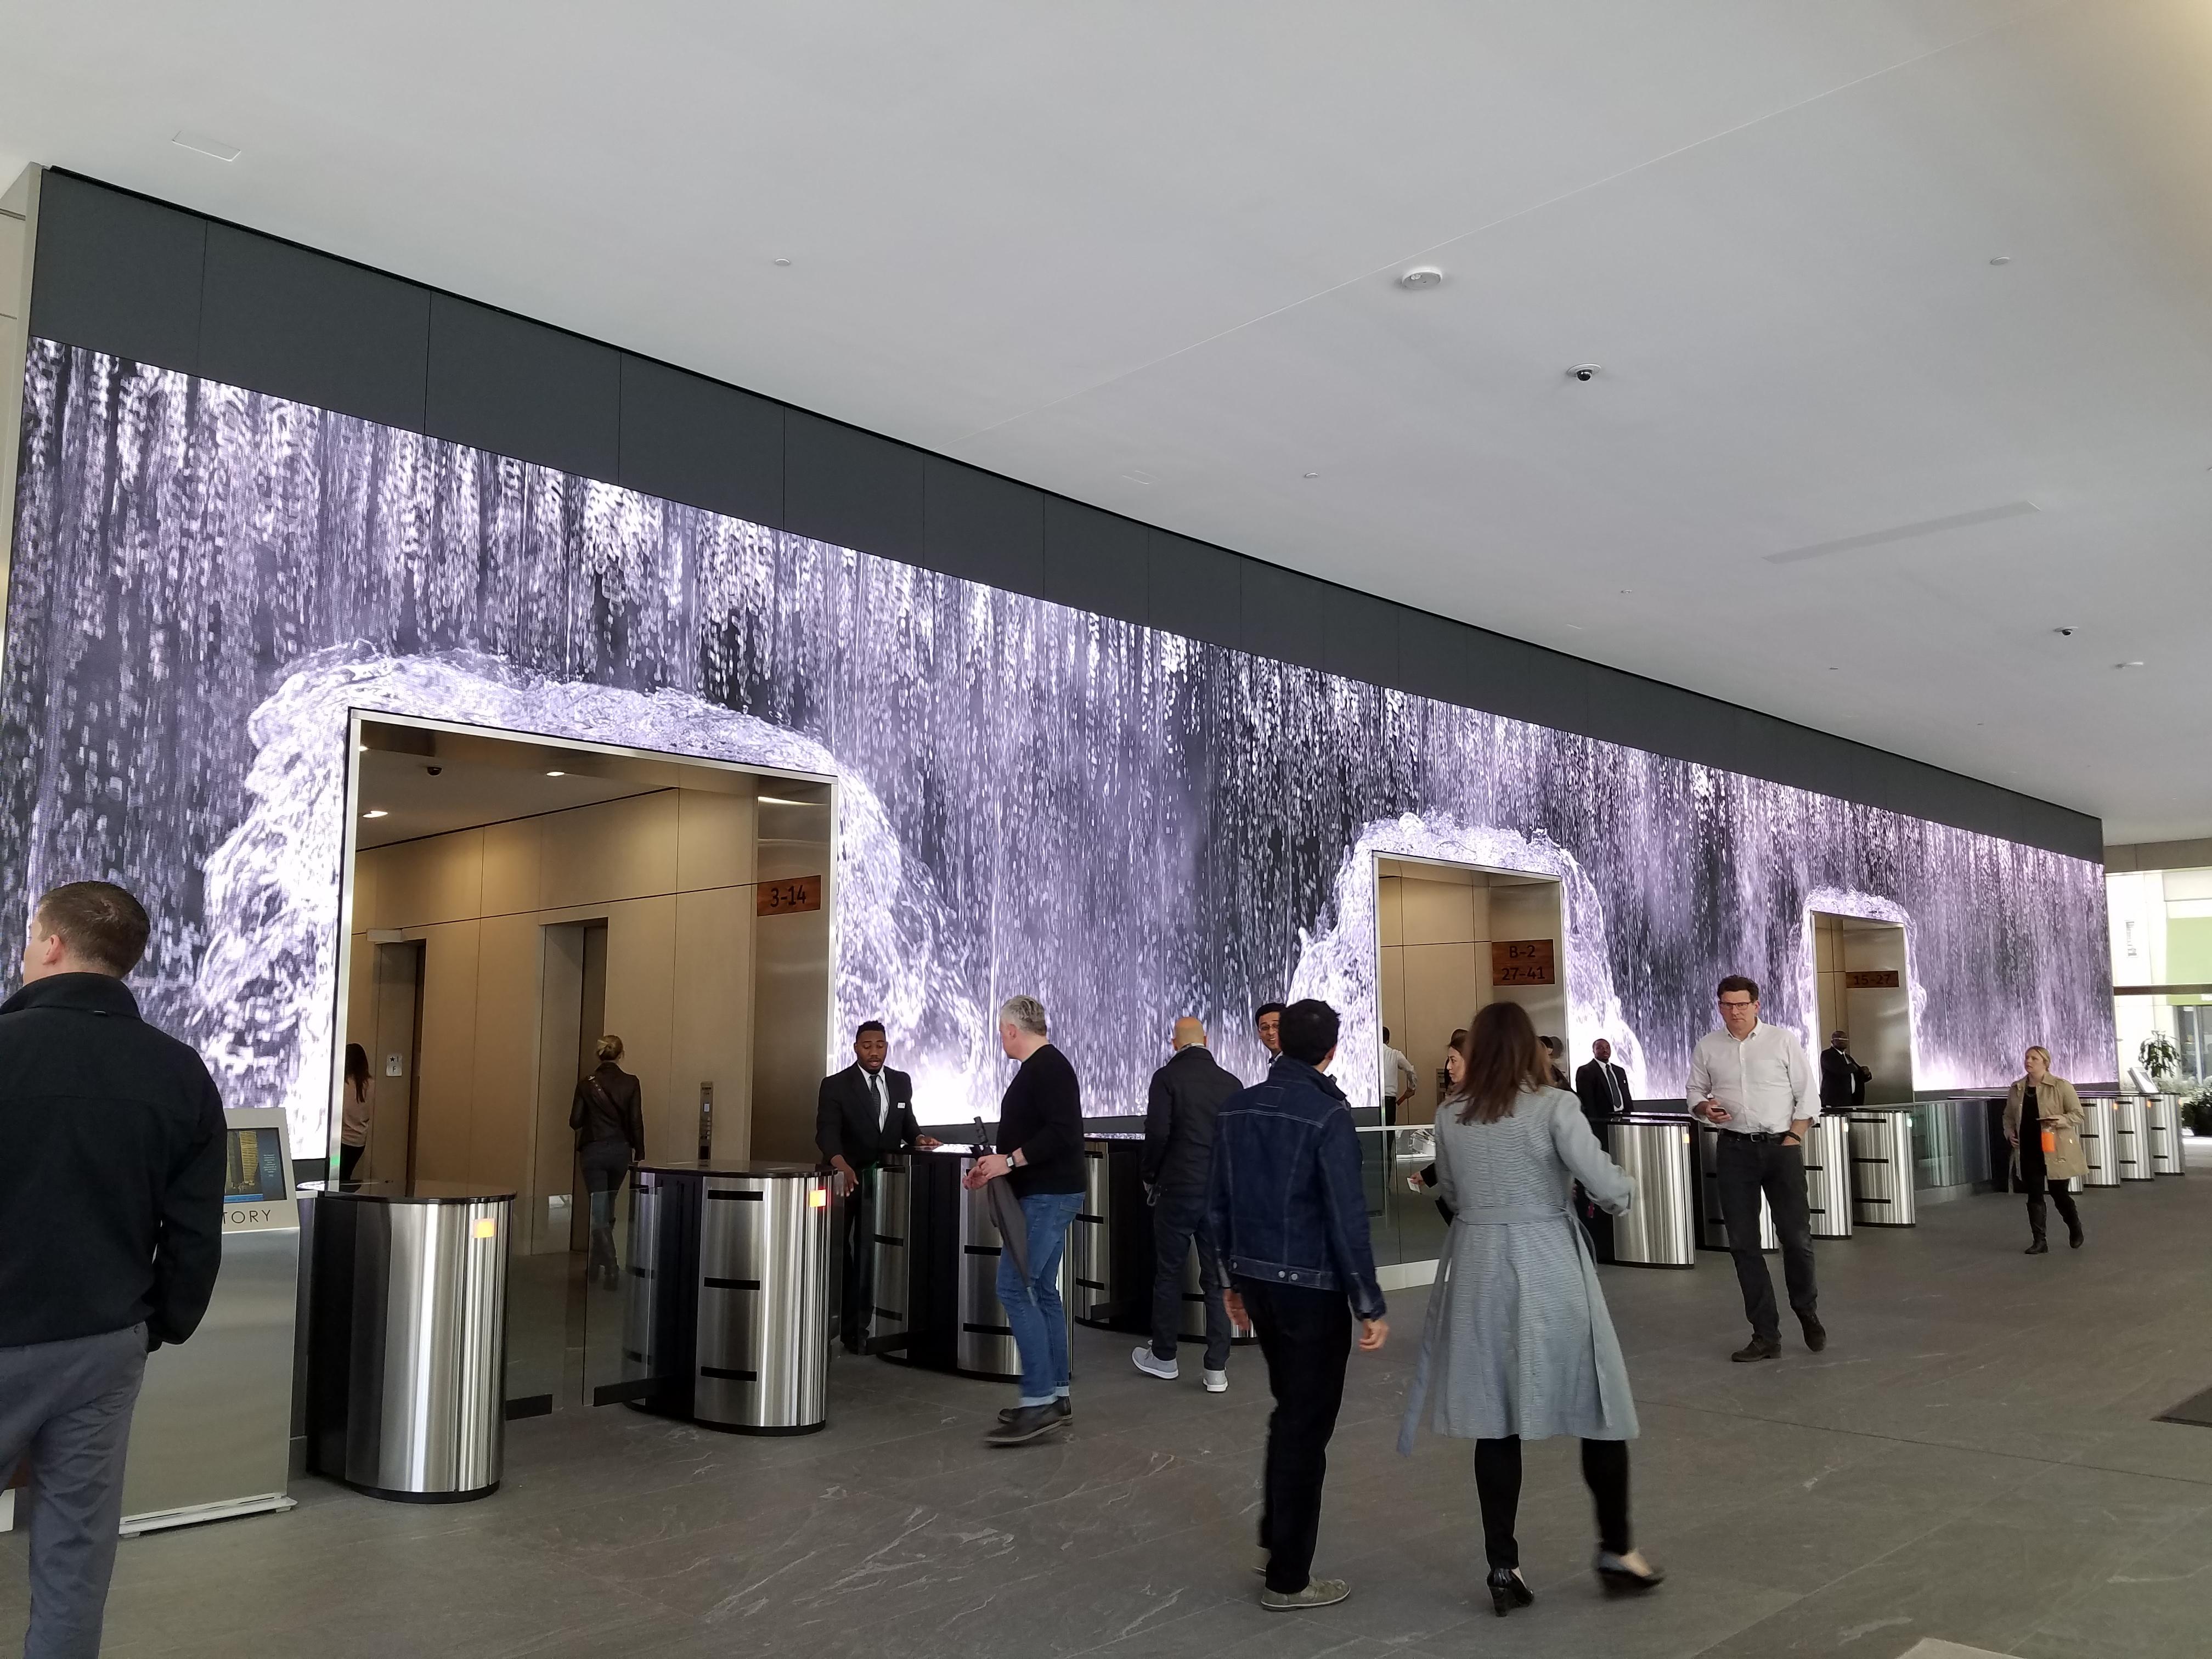 Project Waterfall Video Wall Salesforce Lobby Codaworx